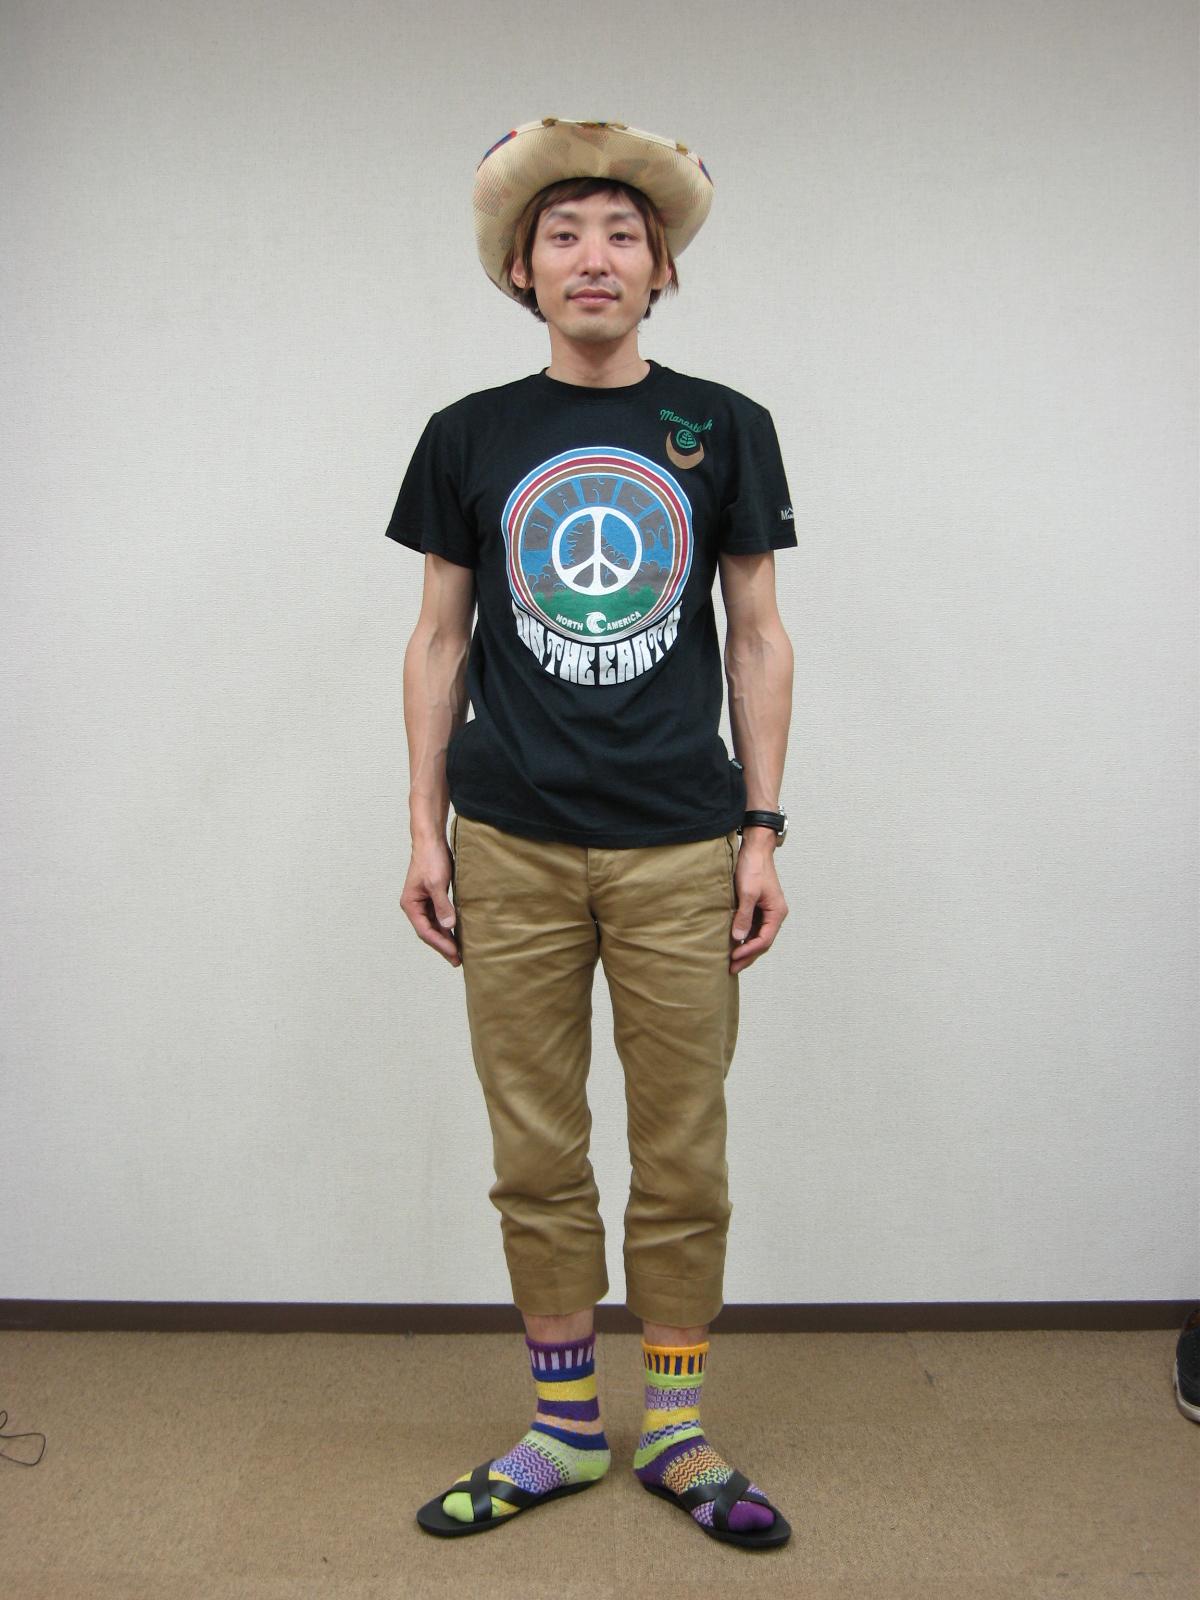 IMG_0384.JPG